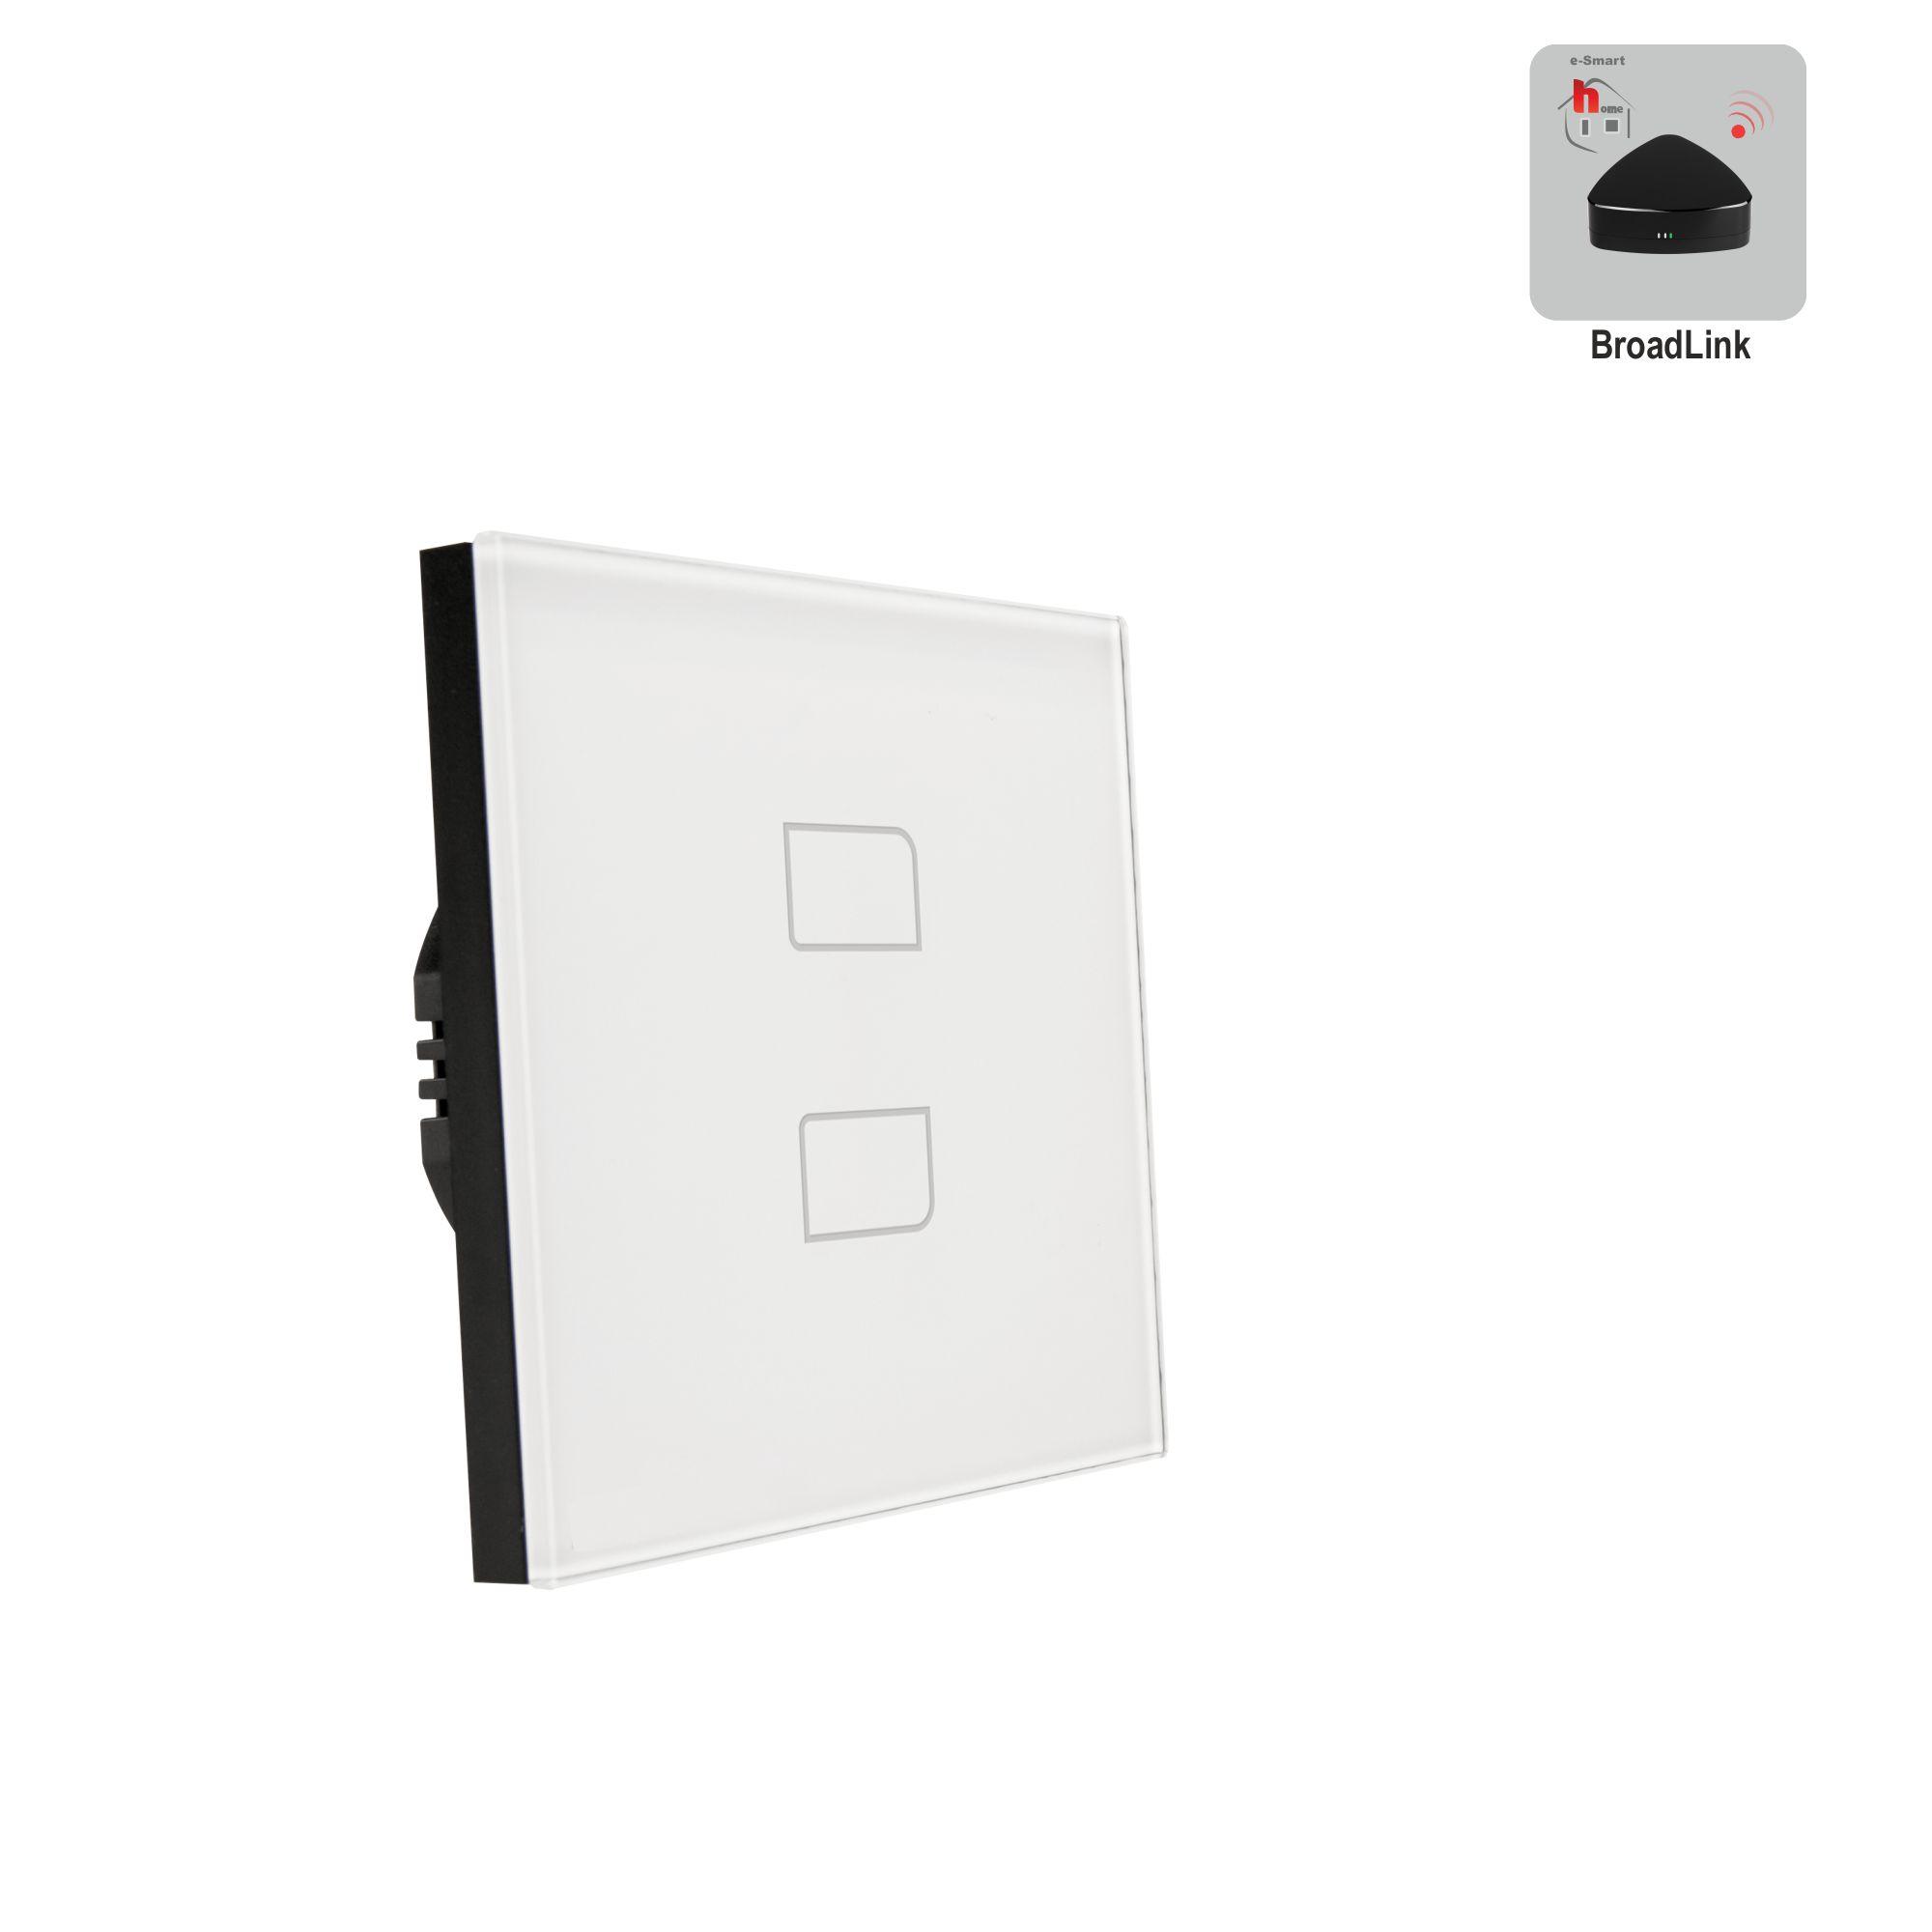 Heicko E Ast Gmbh E Smart Home Touch Screen Switch 86 X